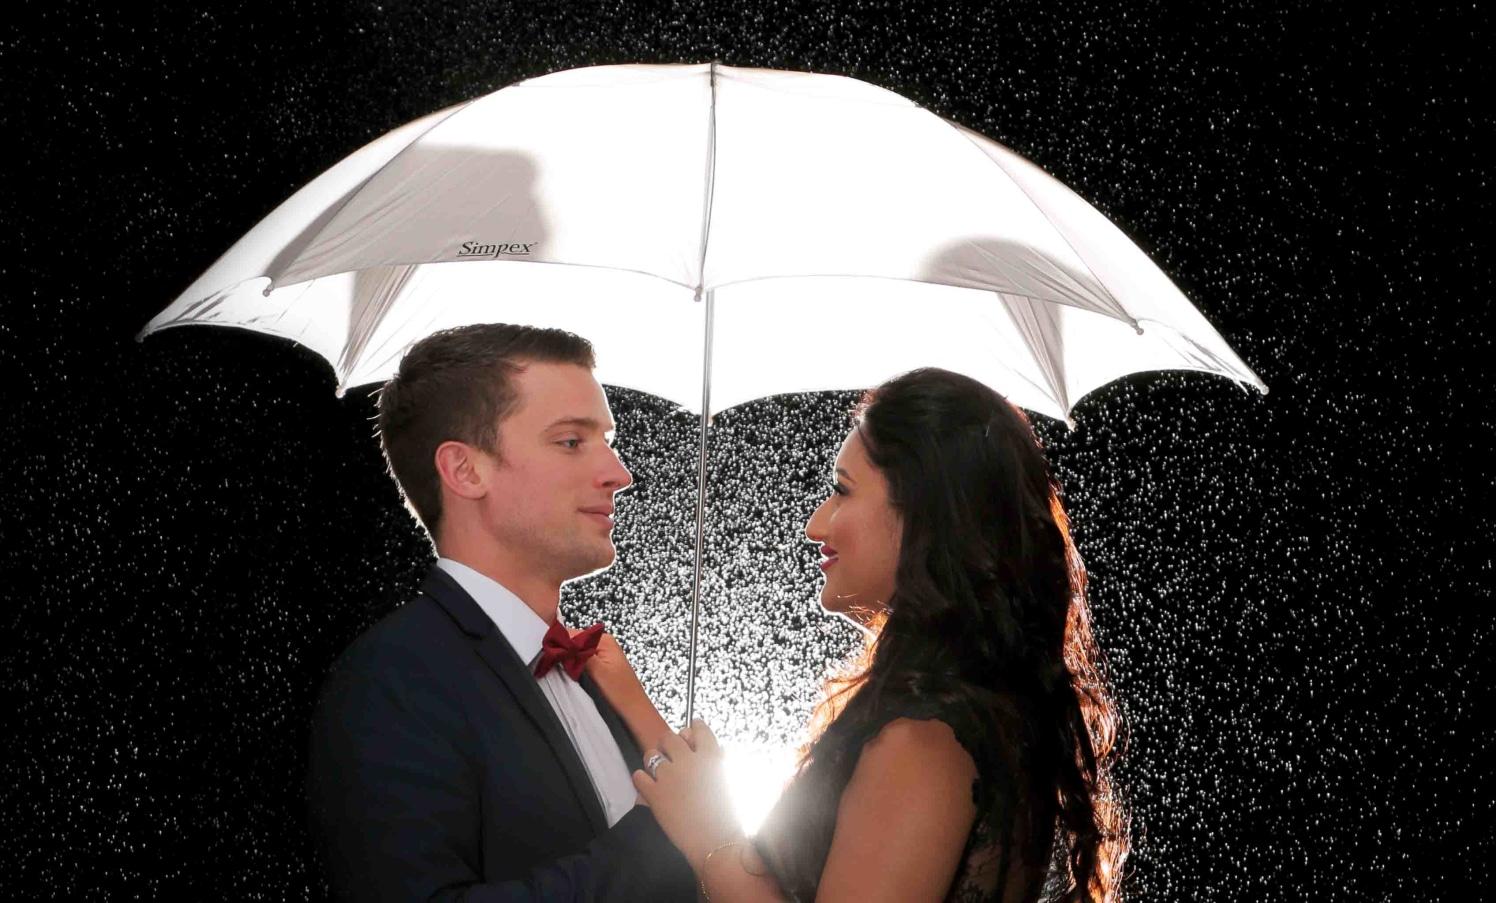 Enchanted scotch mist by Rushil Jadhav Wedding-photography | Weddings Photos & Ideas